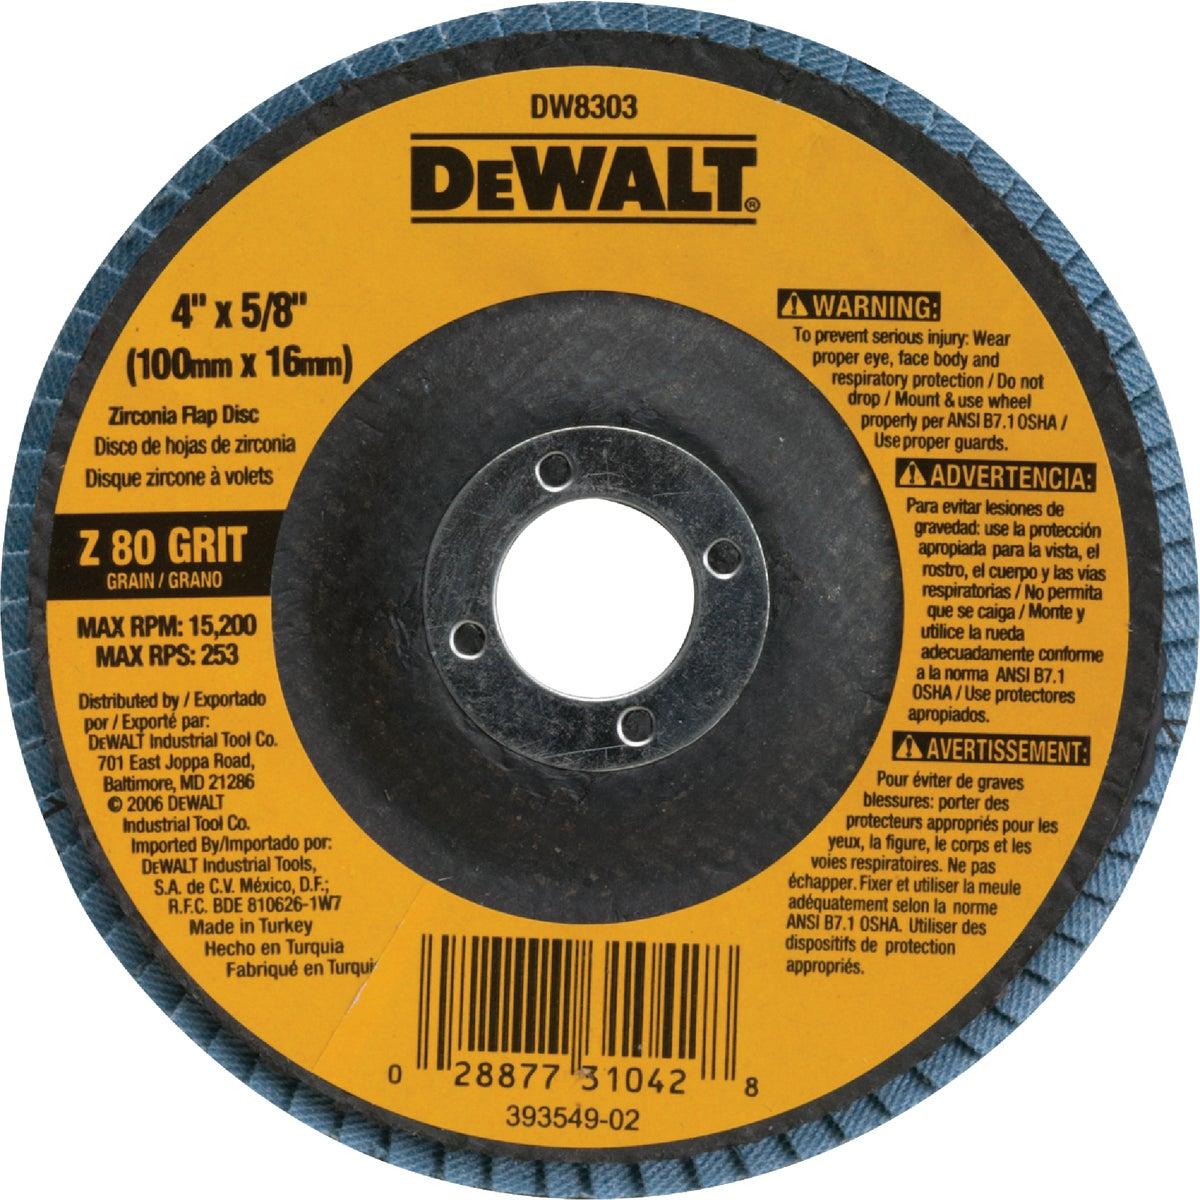 4X5/8 80 GRIT FLAP DISC - DW8303 by DeWalt